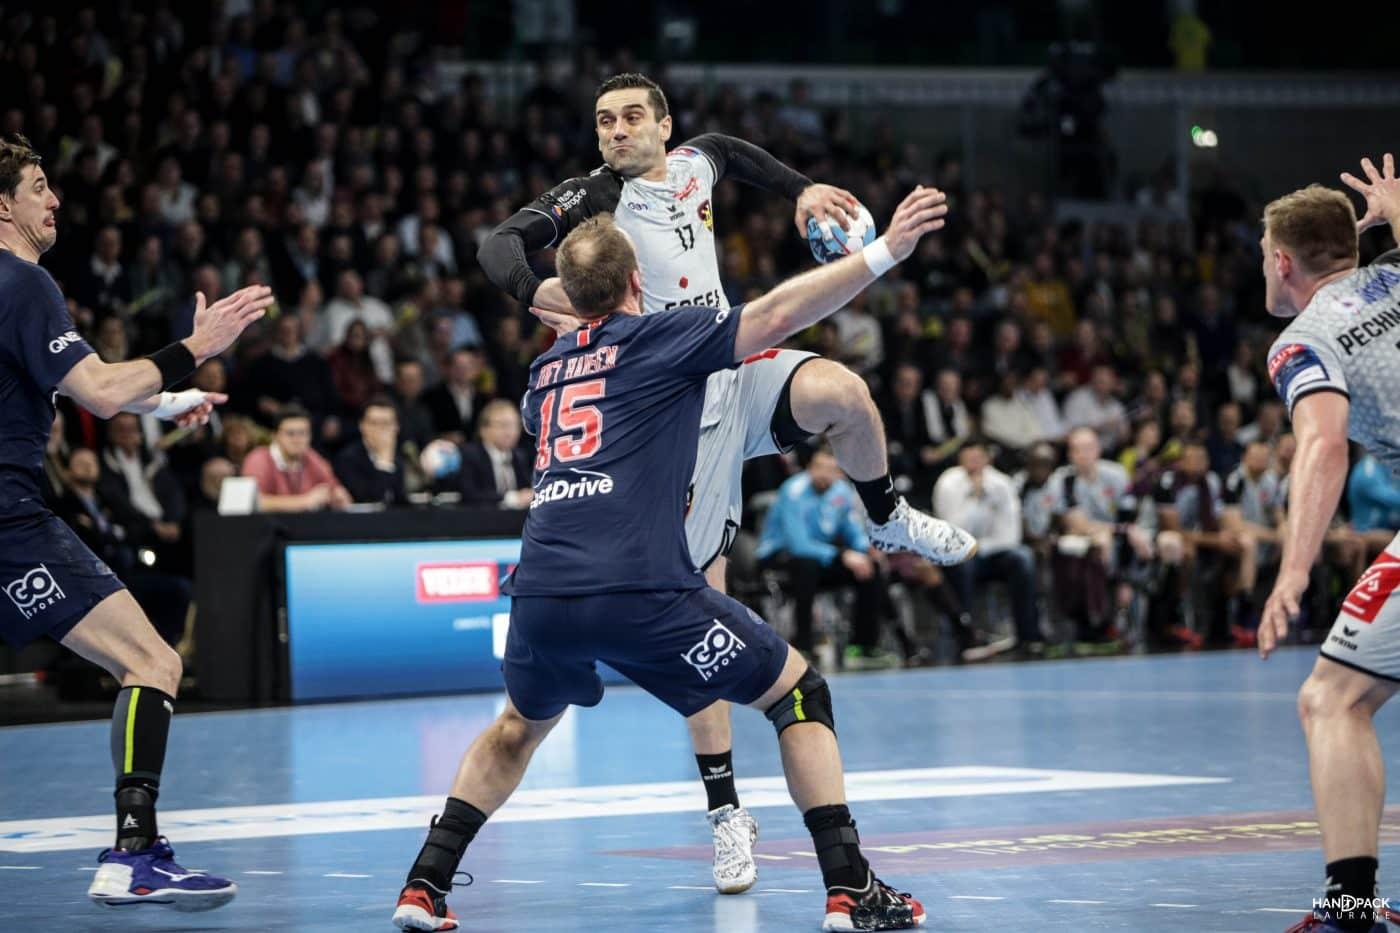 hbc-nantes-paris-saint-germain-handball-ligue-des-champions-2019-handpack-14